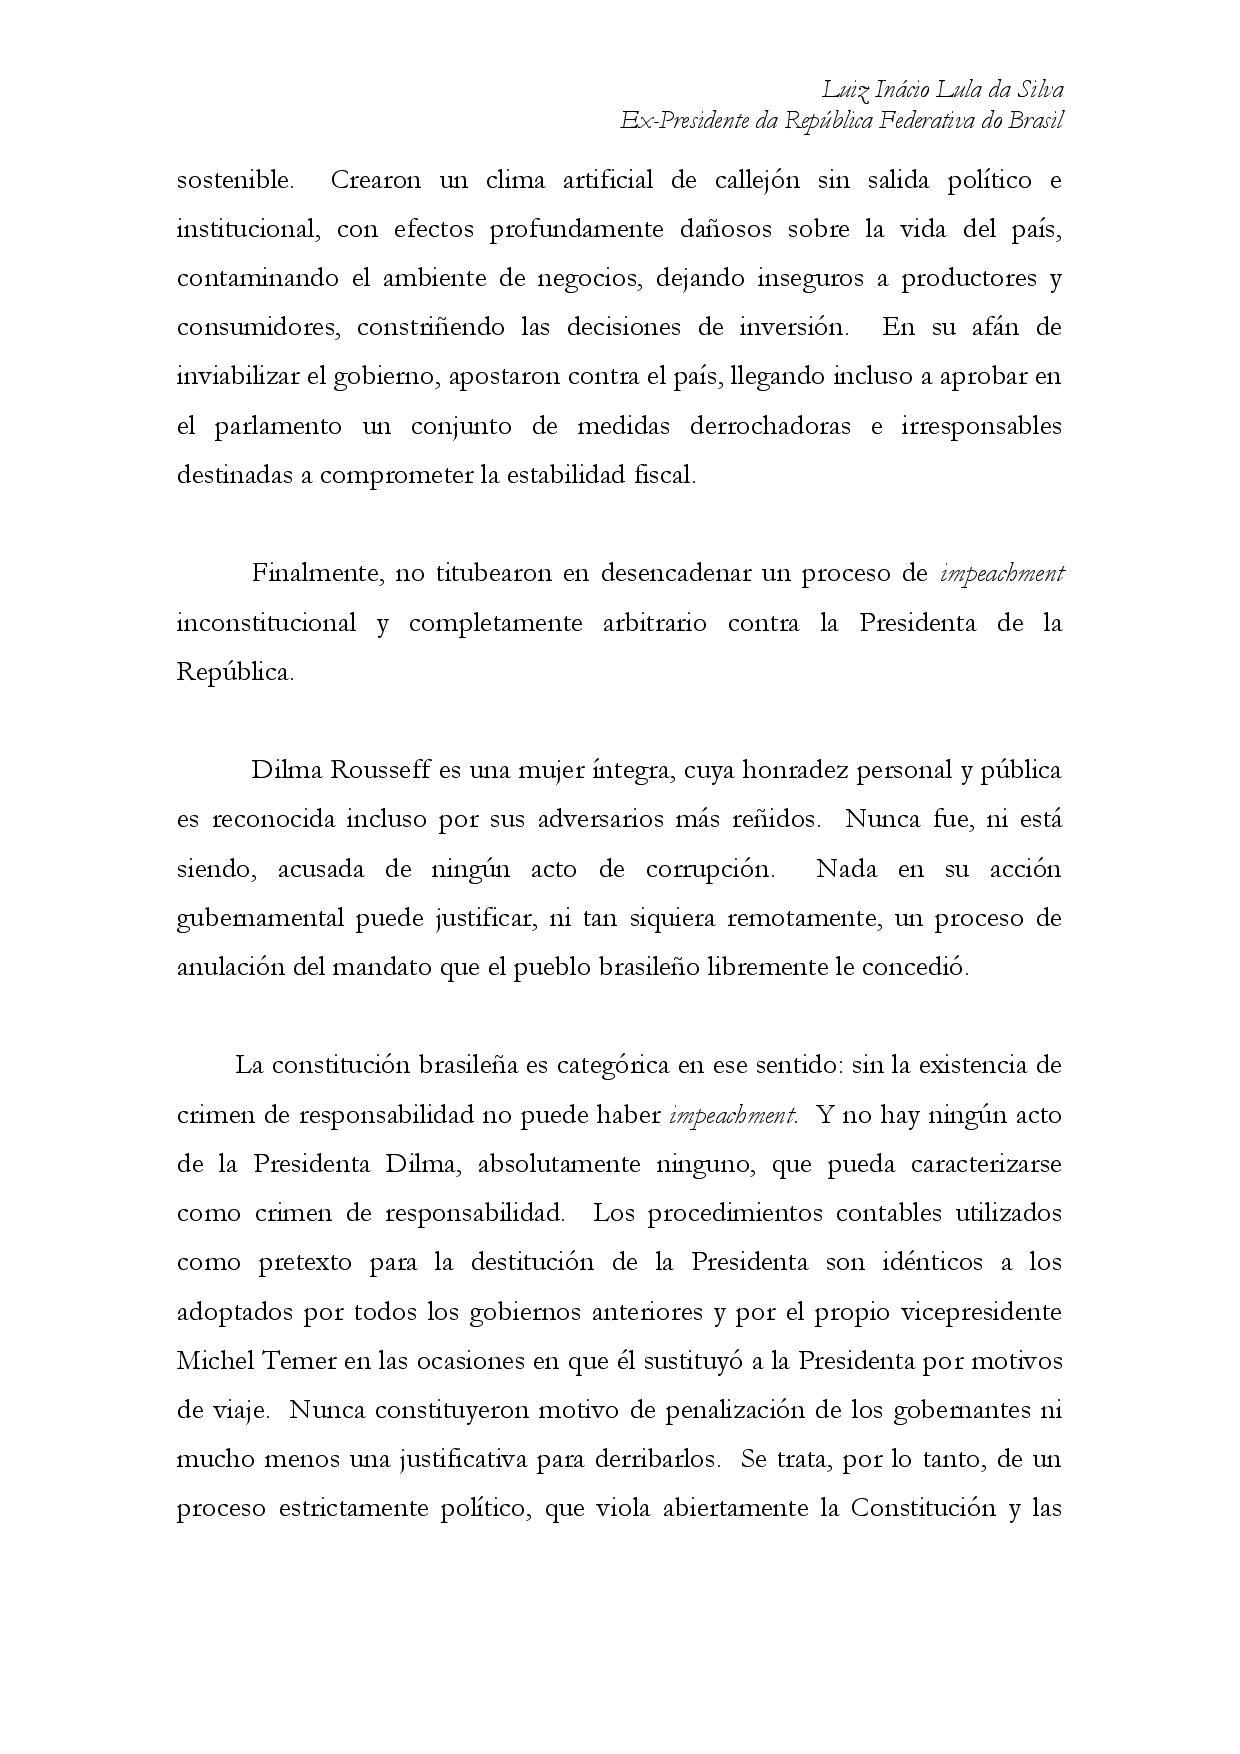 Argentina Ex-presidenta-page-003